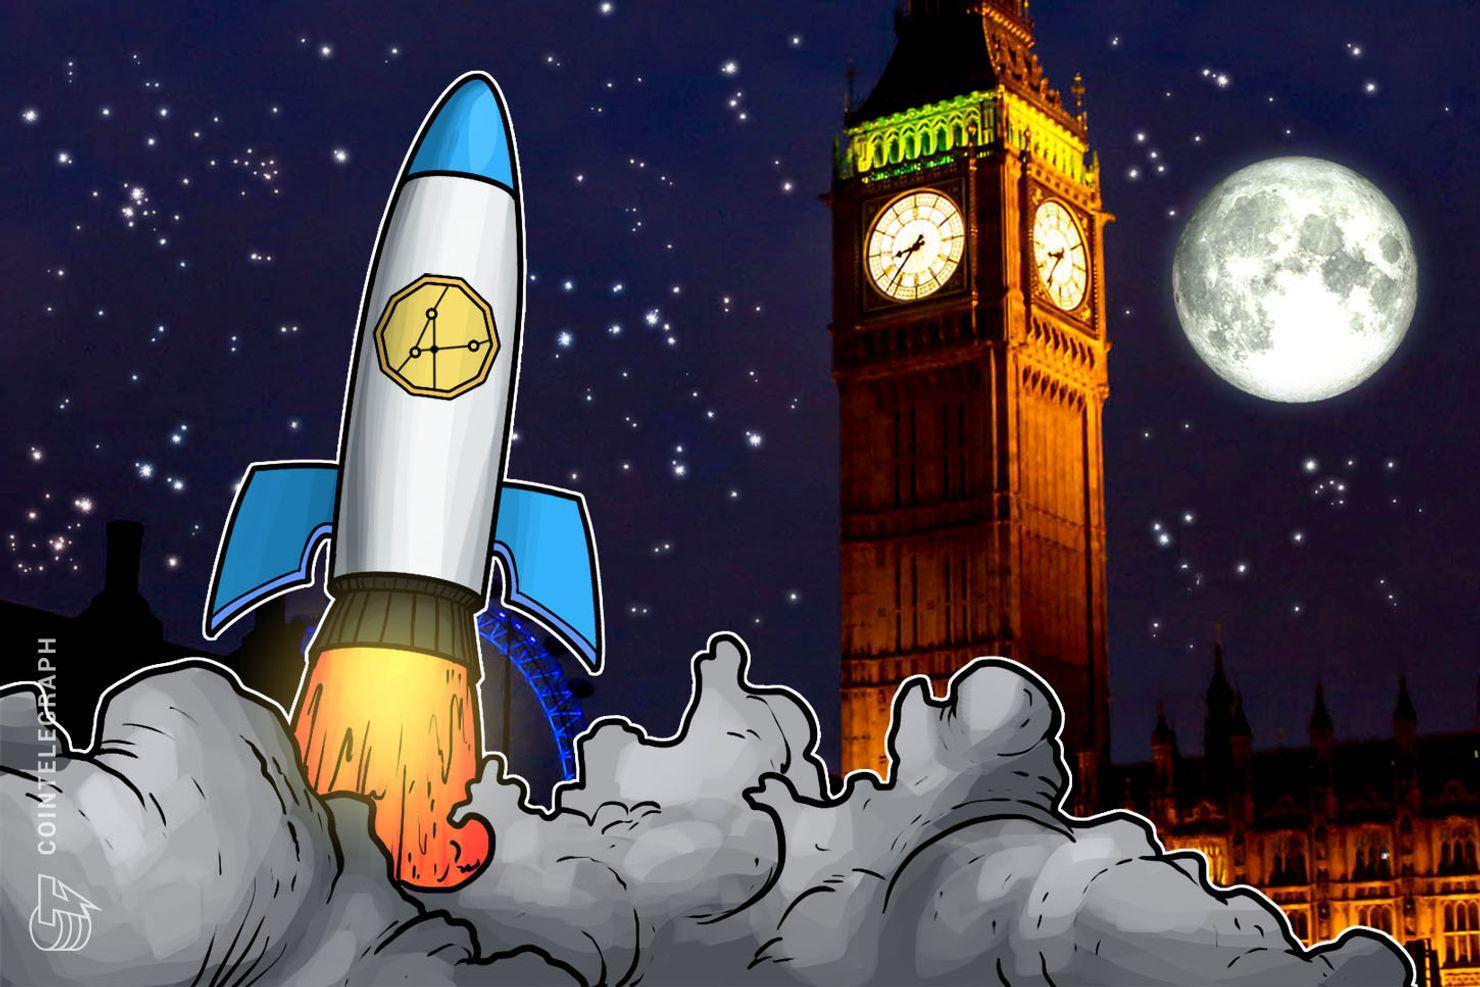 UK Remittance Service TransferGo Adds Crypto Trading